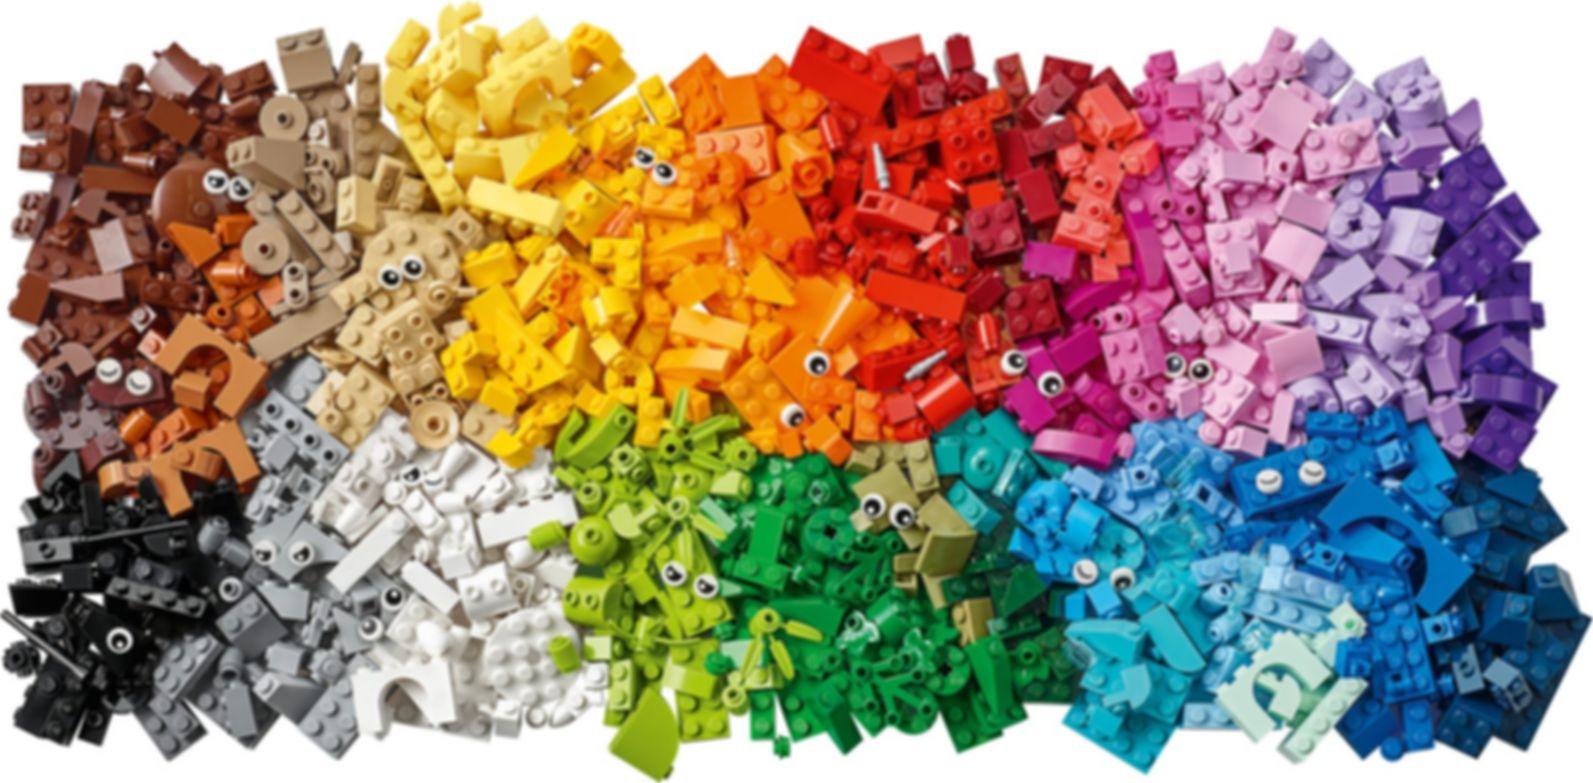 Bricks and Animals components